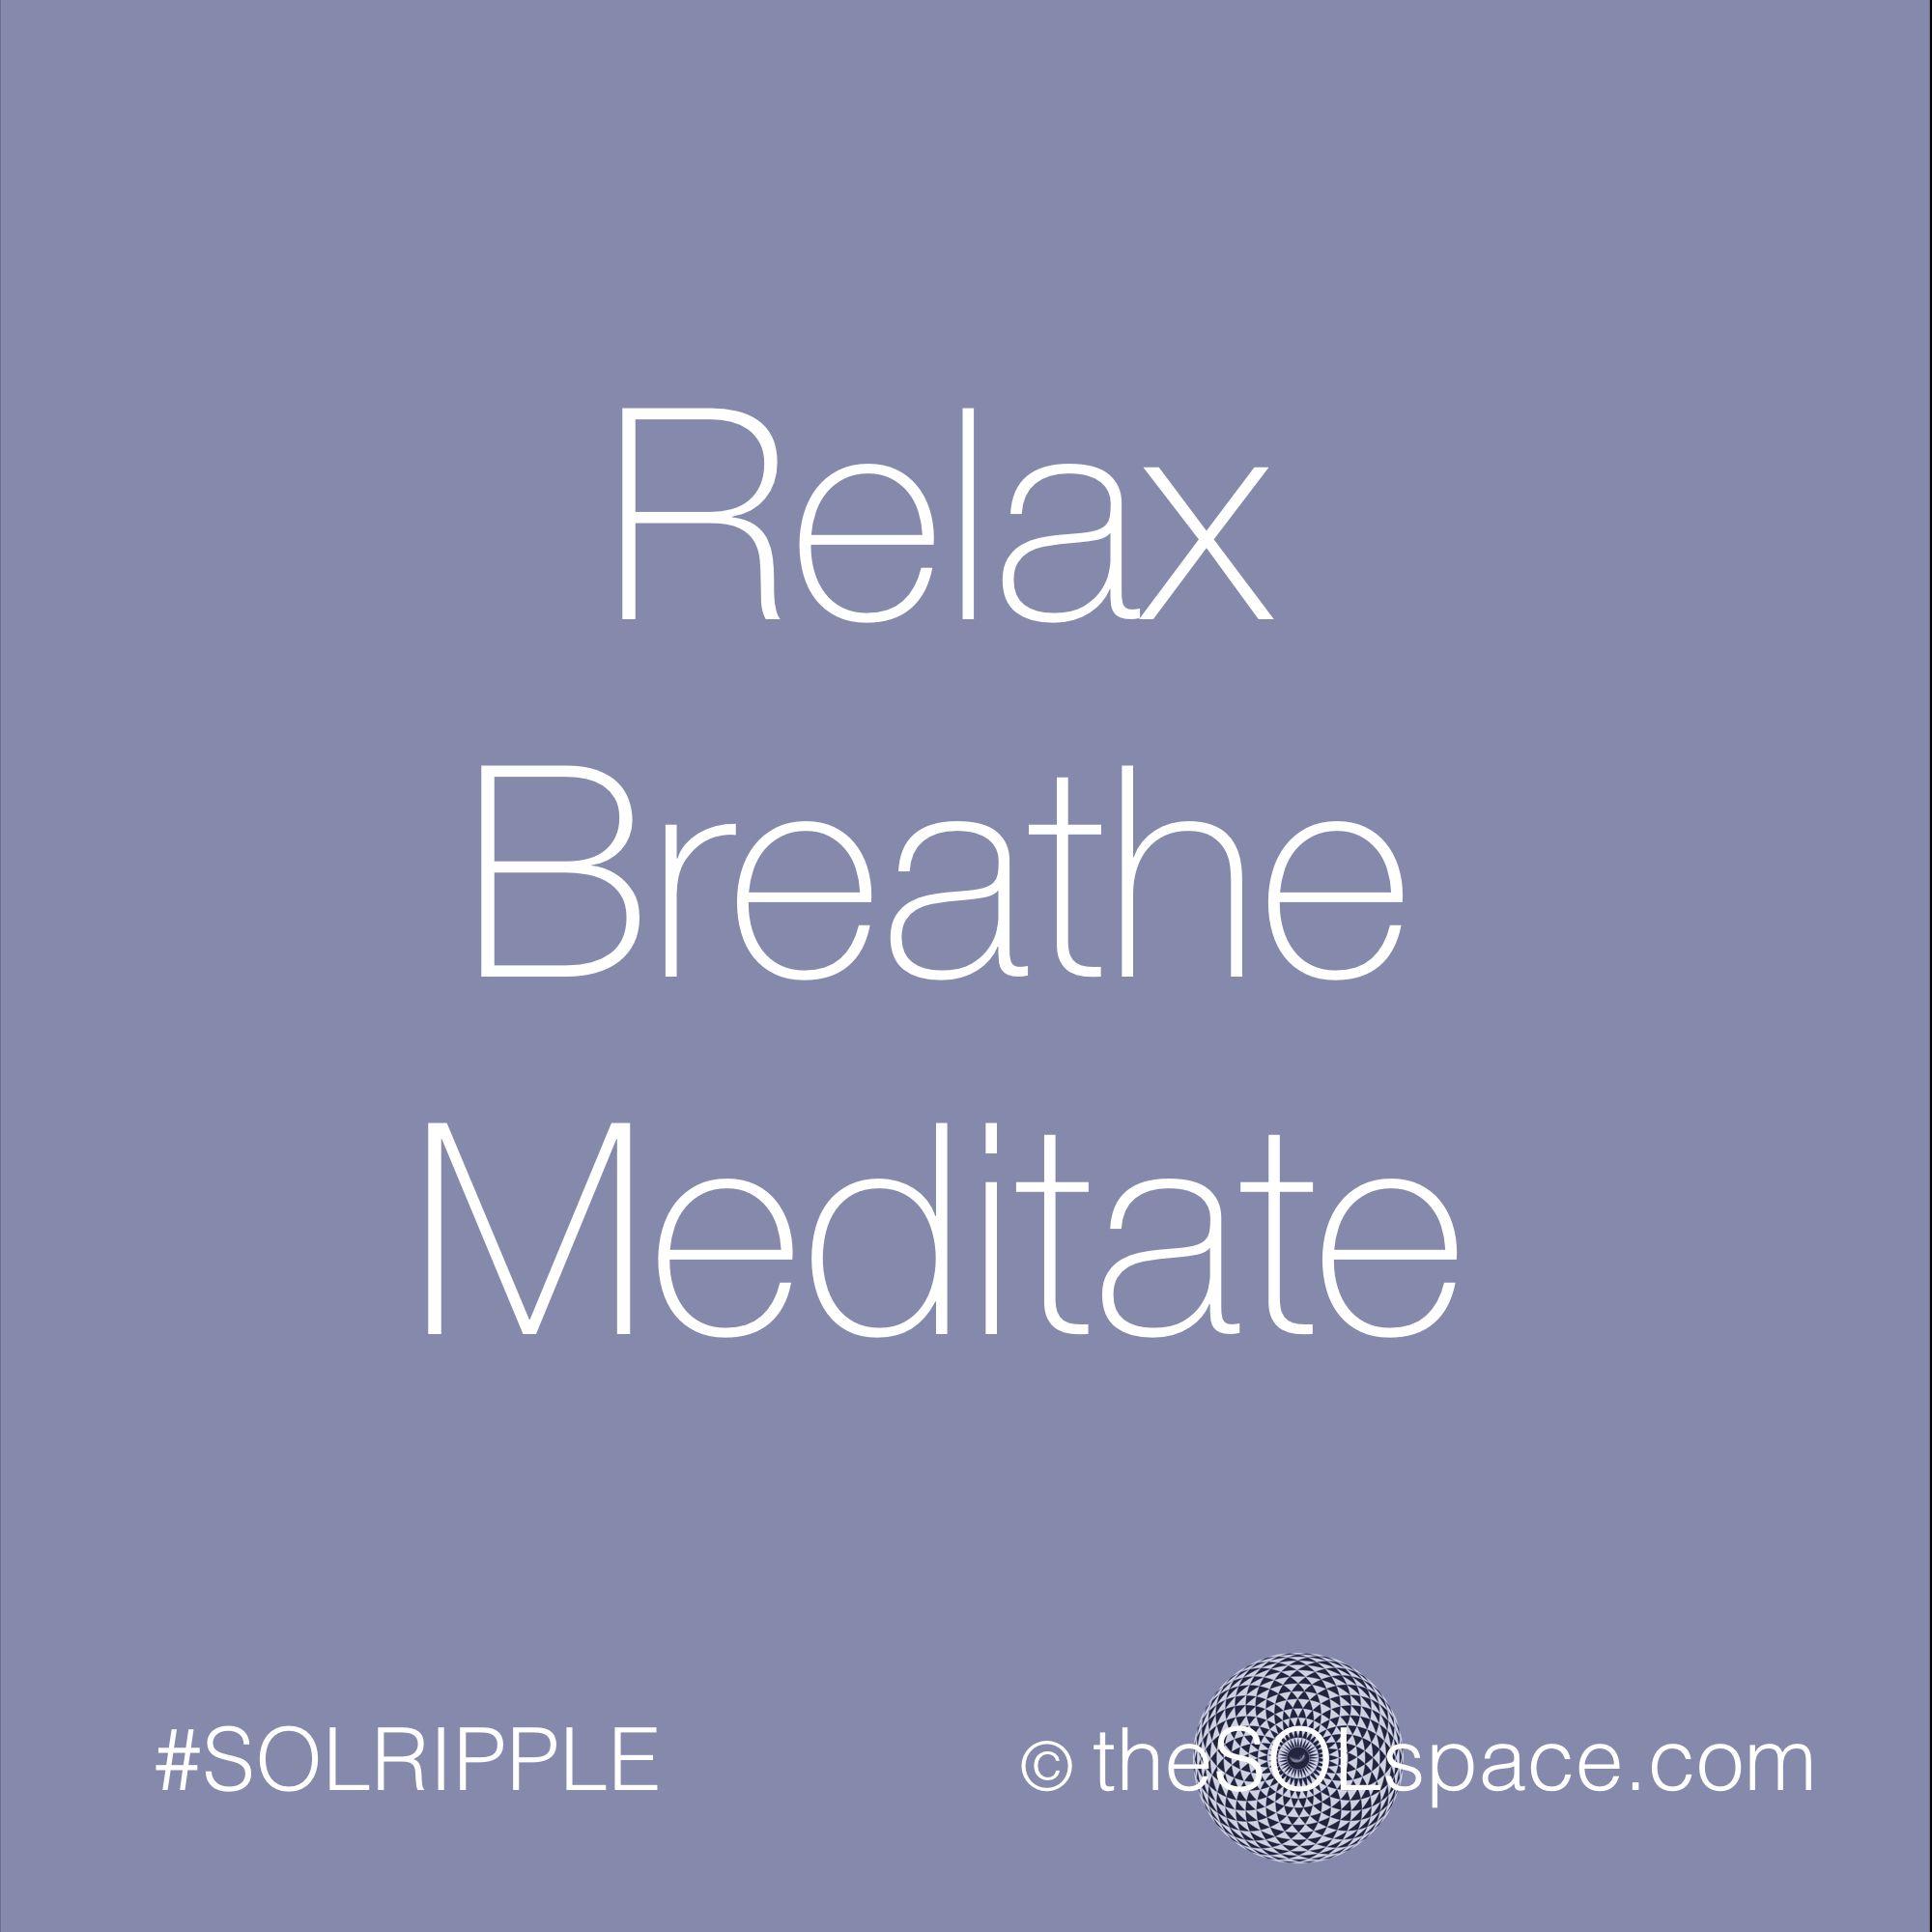 Relax Breathe Meditate....